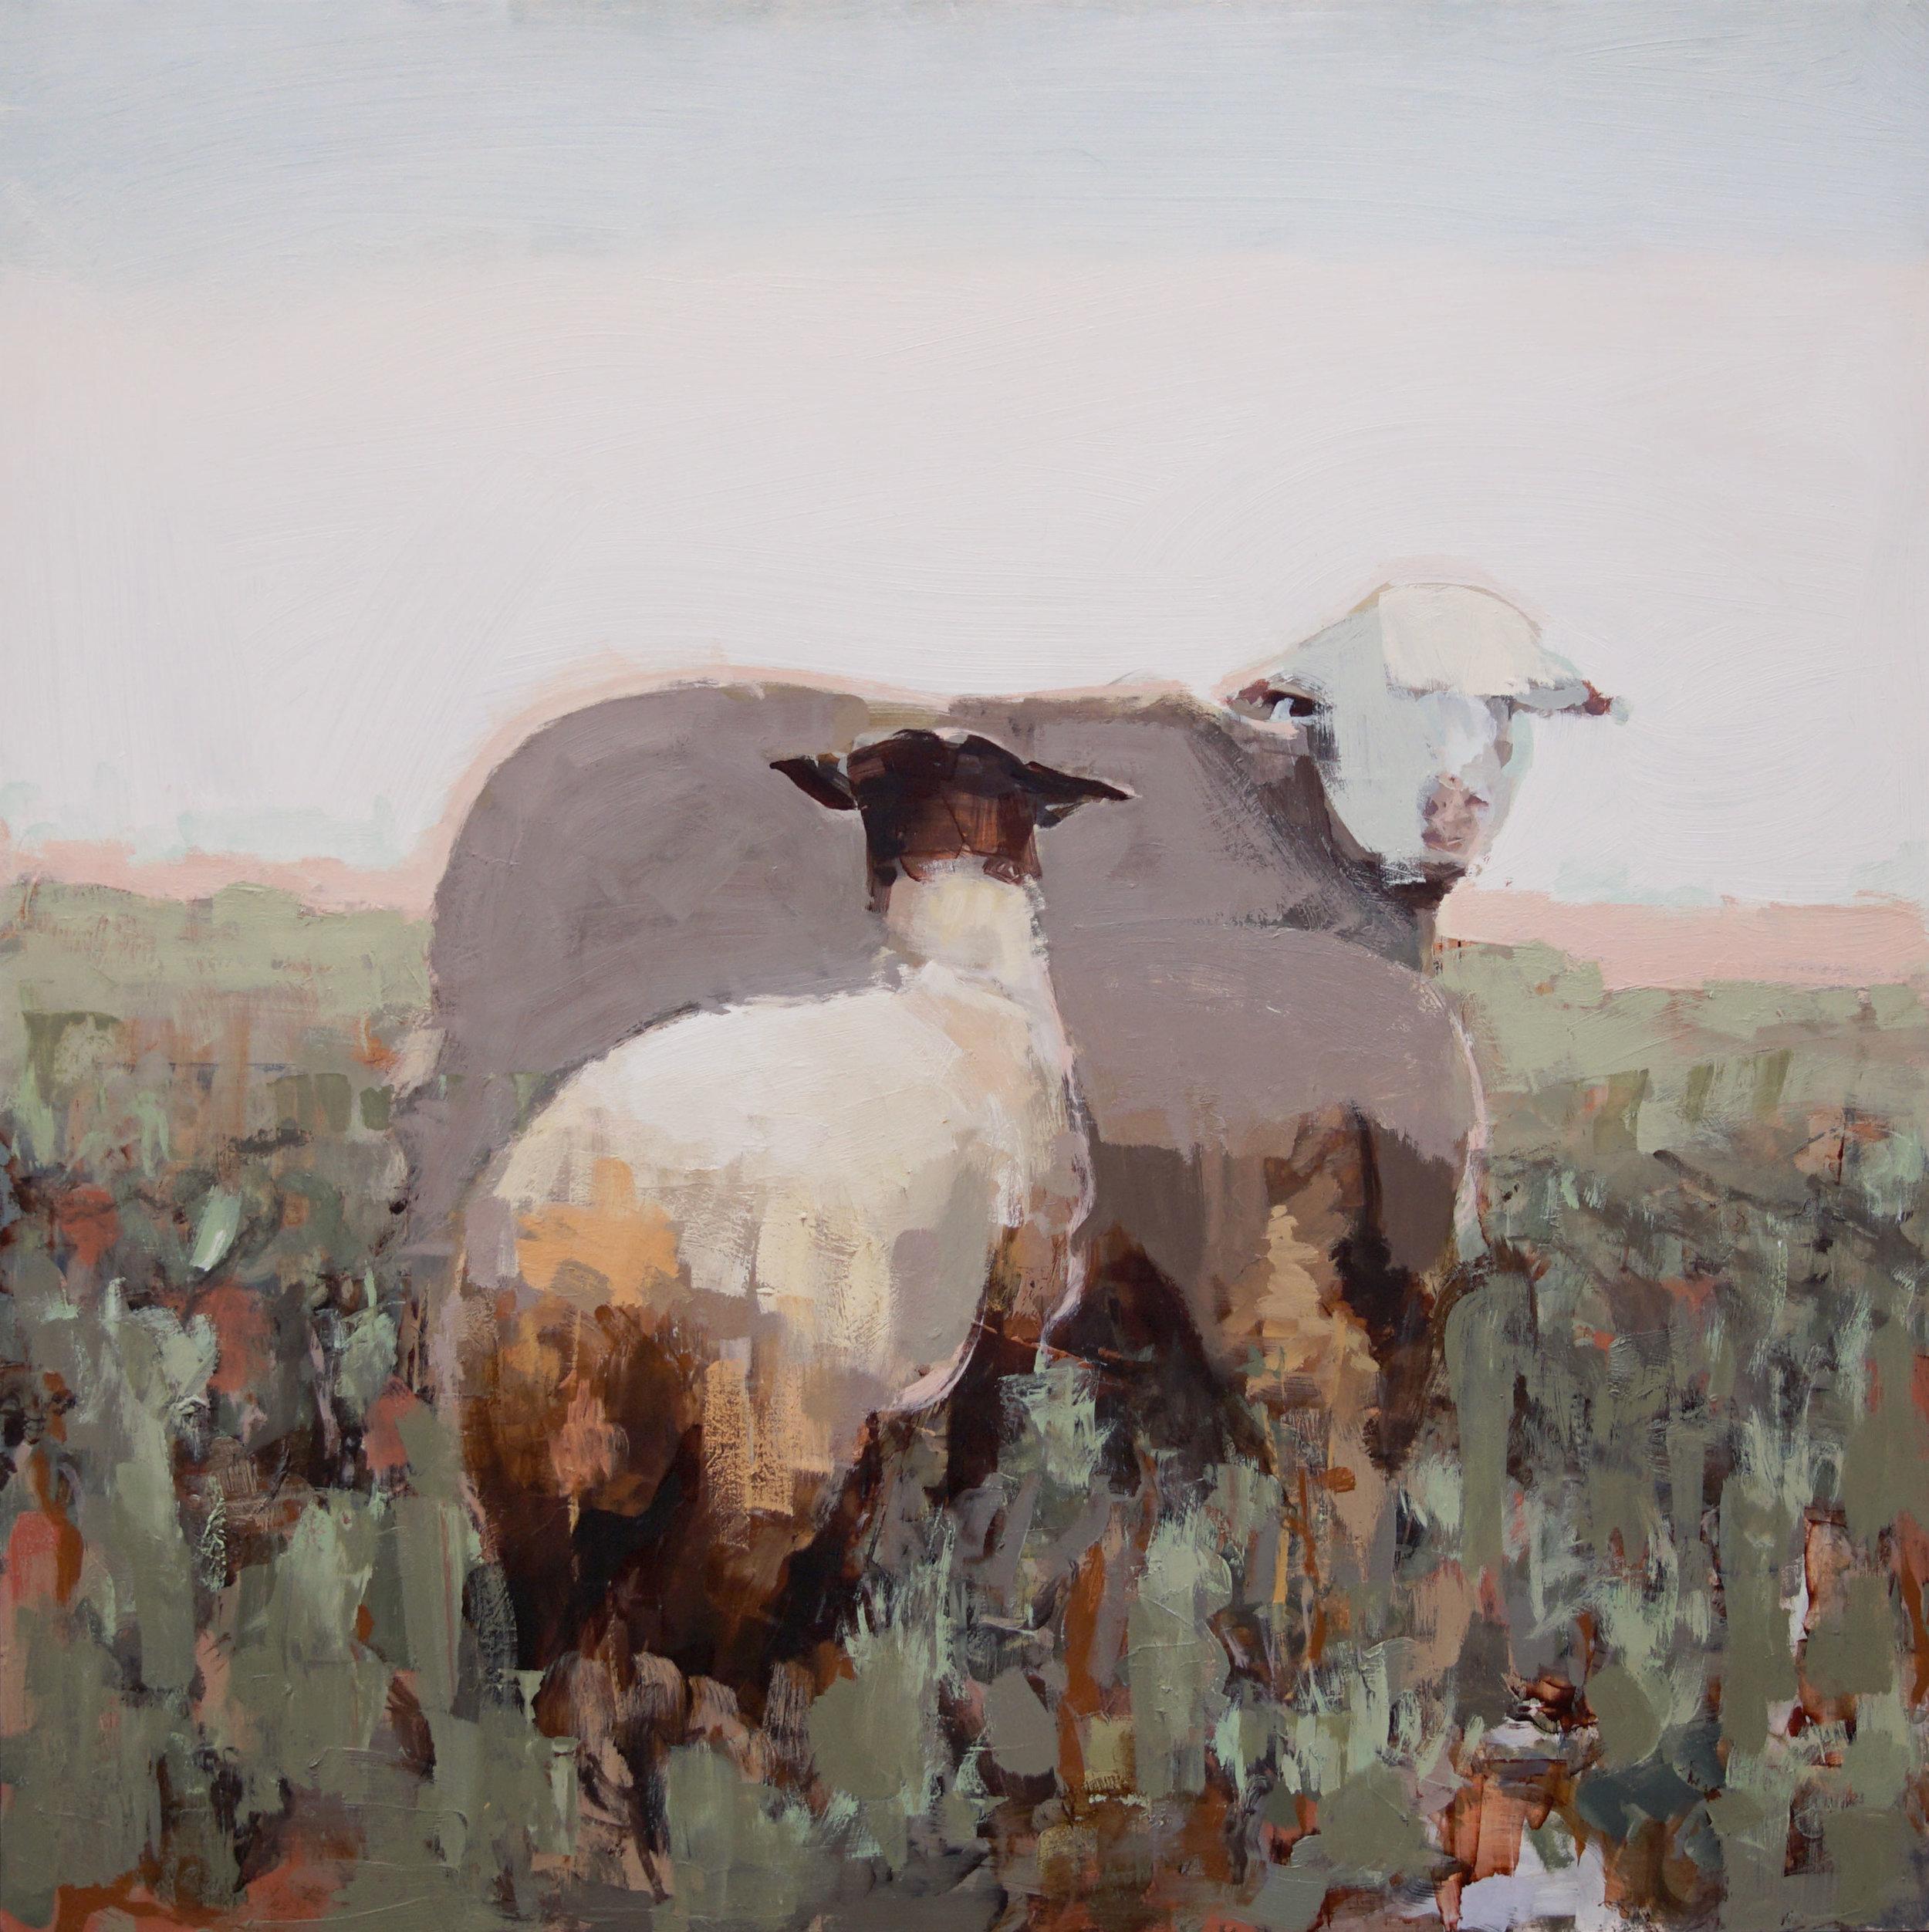 mark-crenshaw-1756-strawberry-sheep.jpg